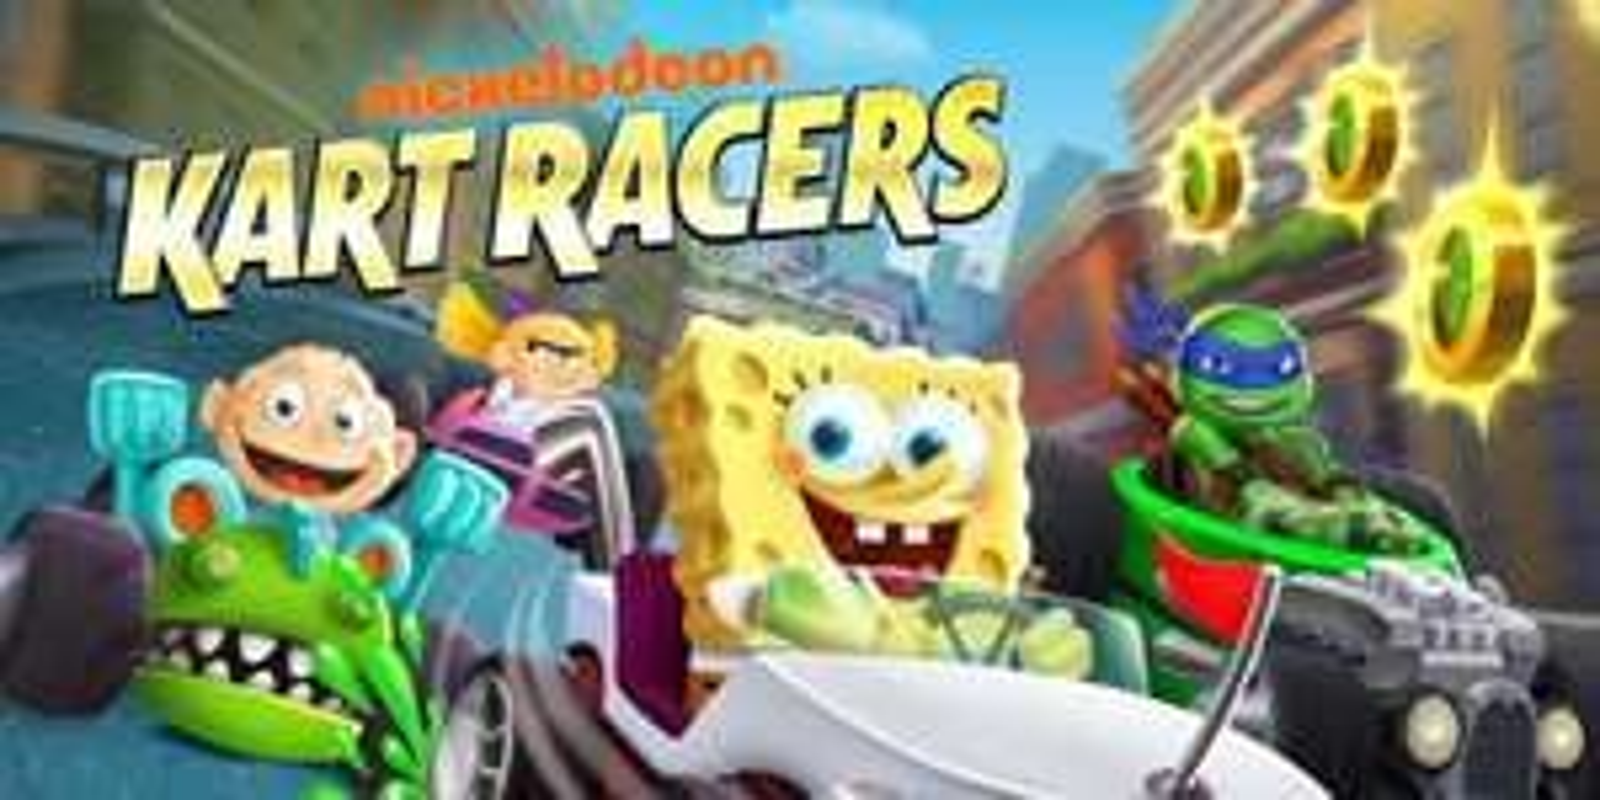 Nickelodeon Kart Racers (Switch digital copy) - £10.79 @ Nintendo eShop